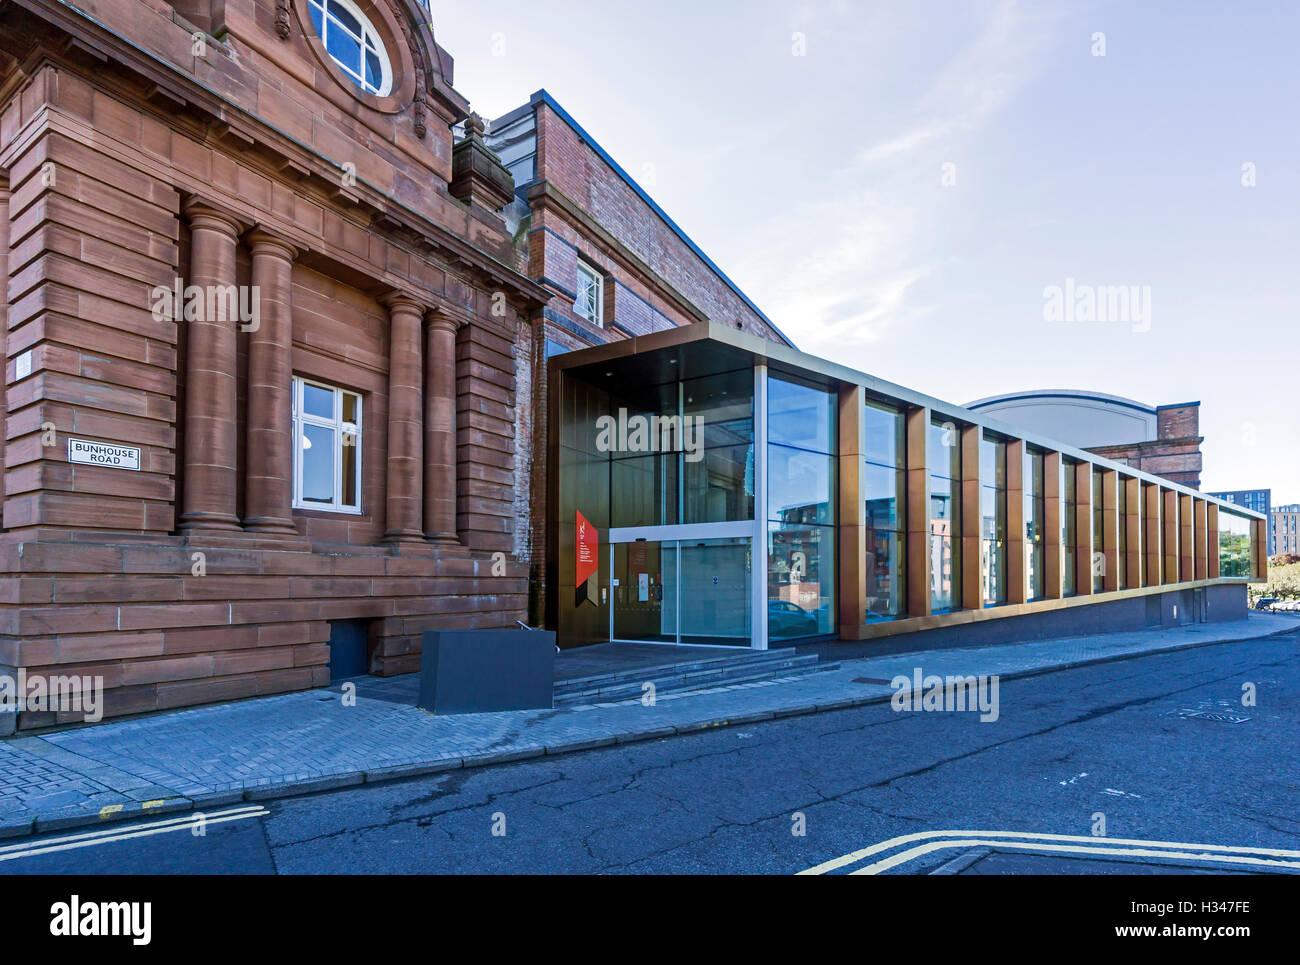 New Kelvin Hall extension on Burnhouse Road off Argyle Street in Glasgow Scotland - Stock Image